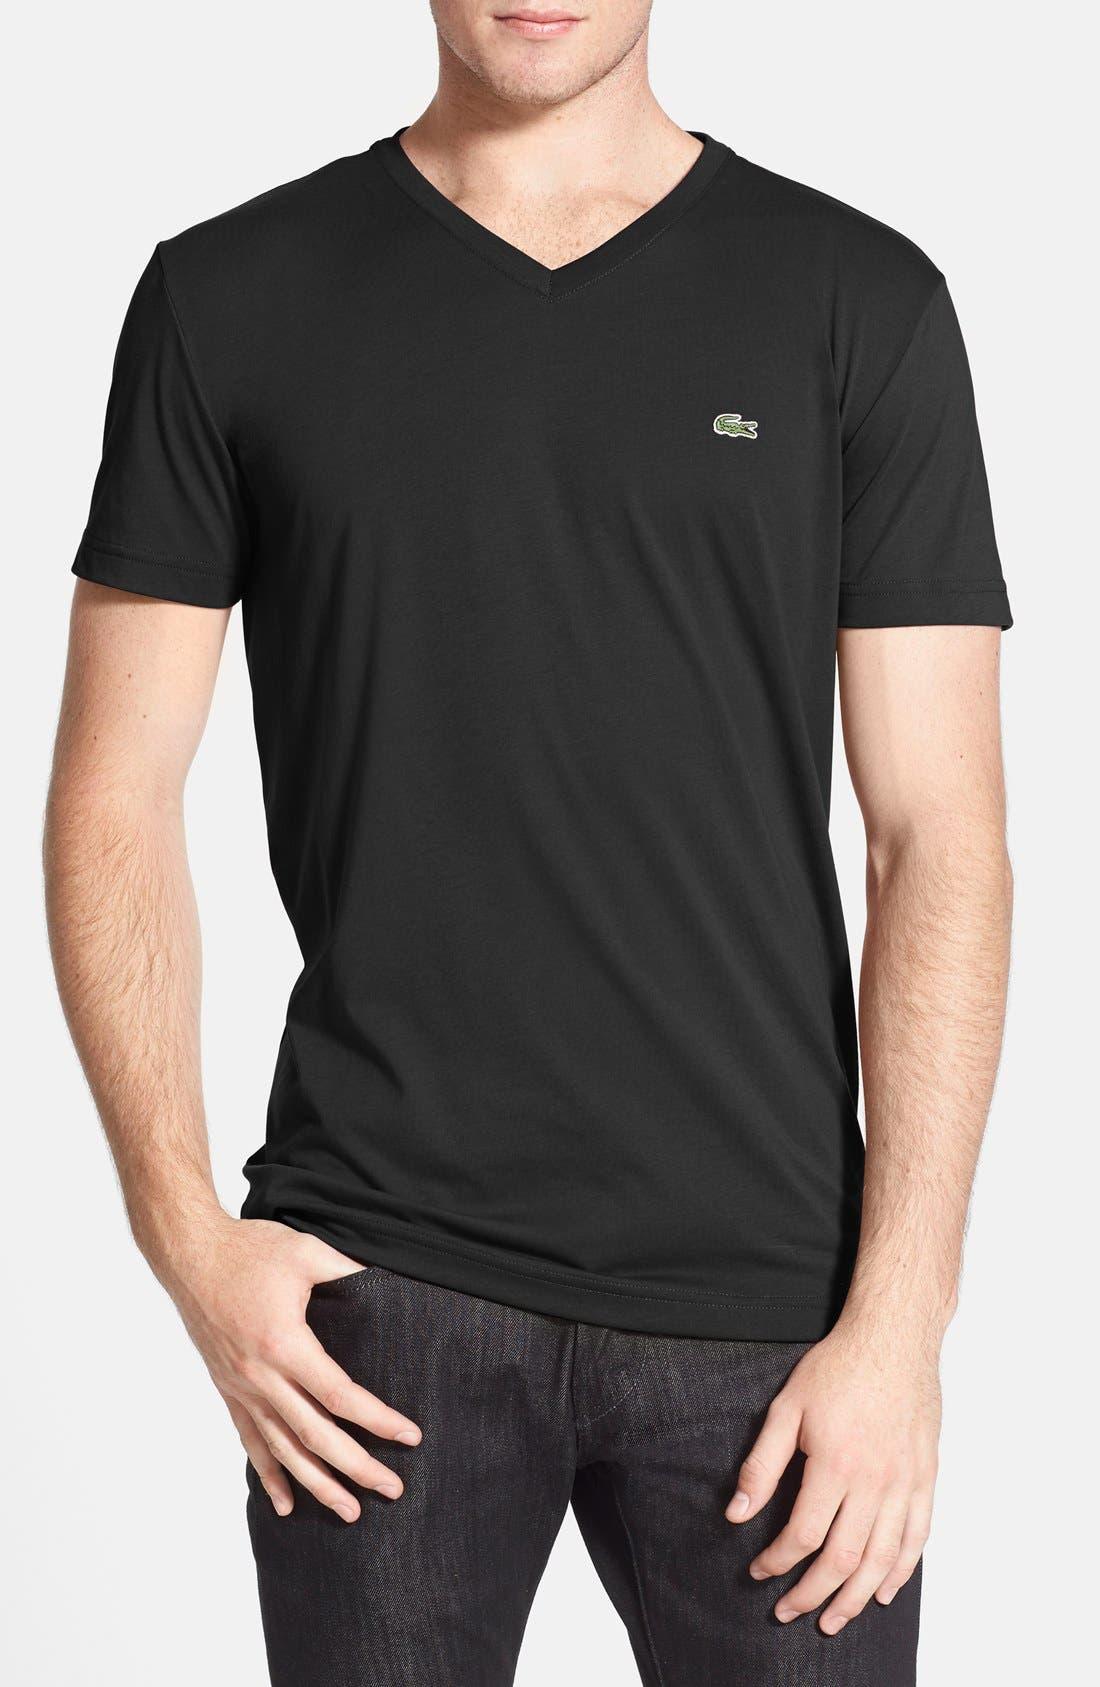 Main Image - Lacoste Pima Cotton Jersey V-Neck T-Shirt